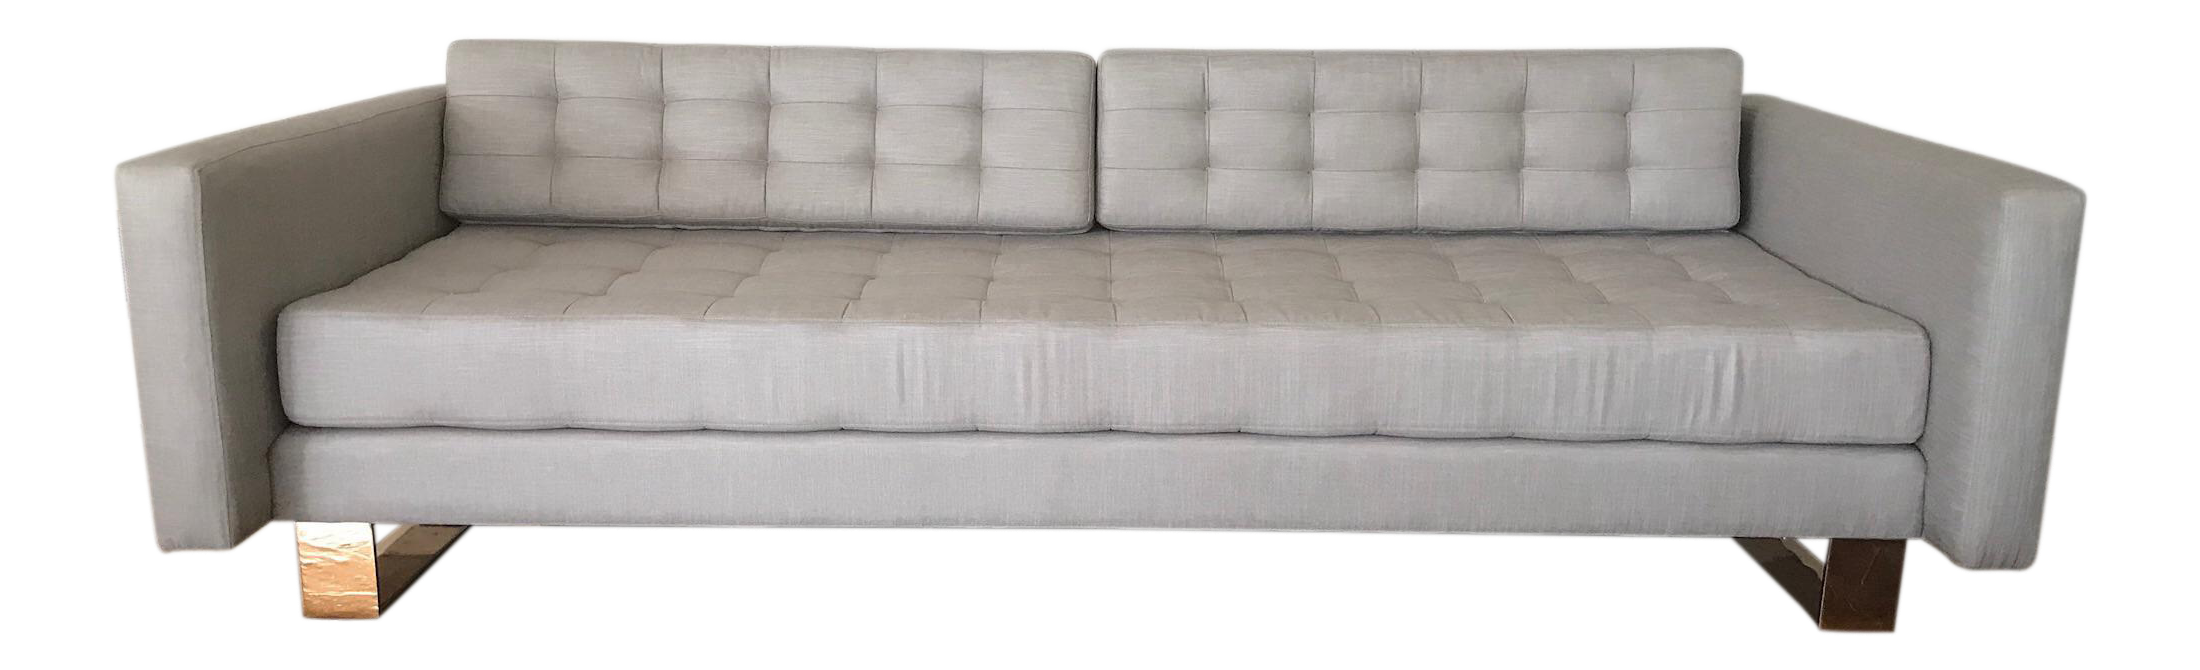 Kelly Hoppen Vinci Sofa For Sale